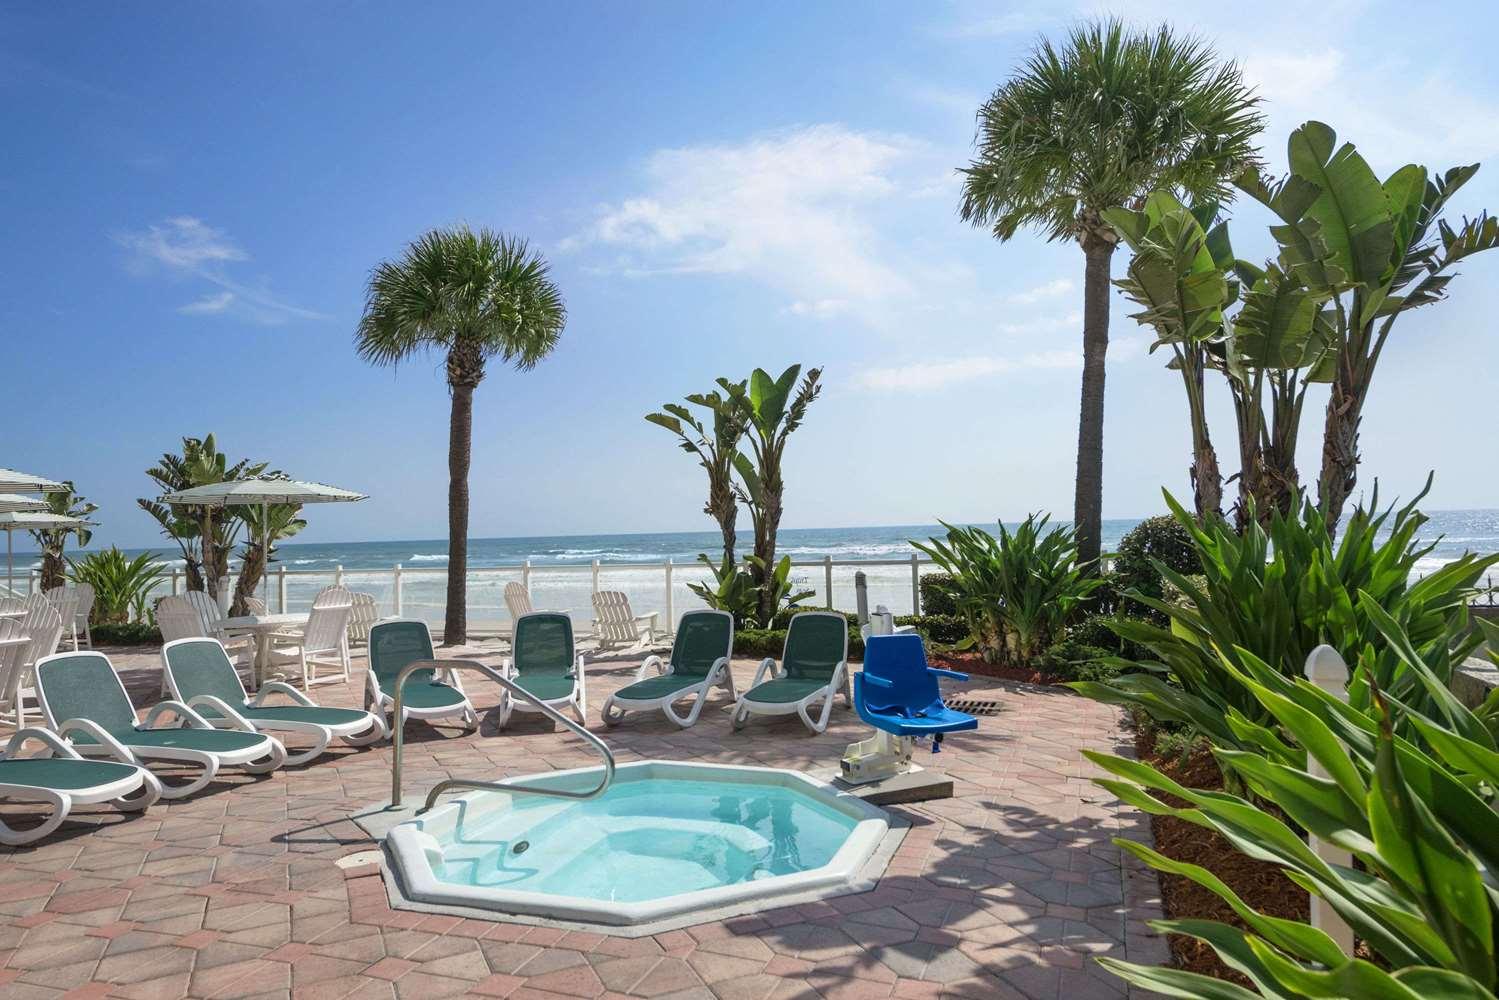 Recreation - Days Inn Oceanfront Daytona Beach Shores